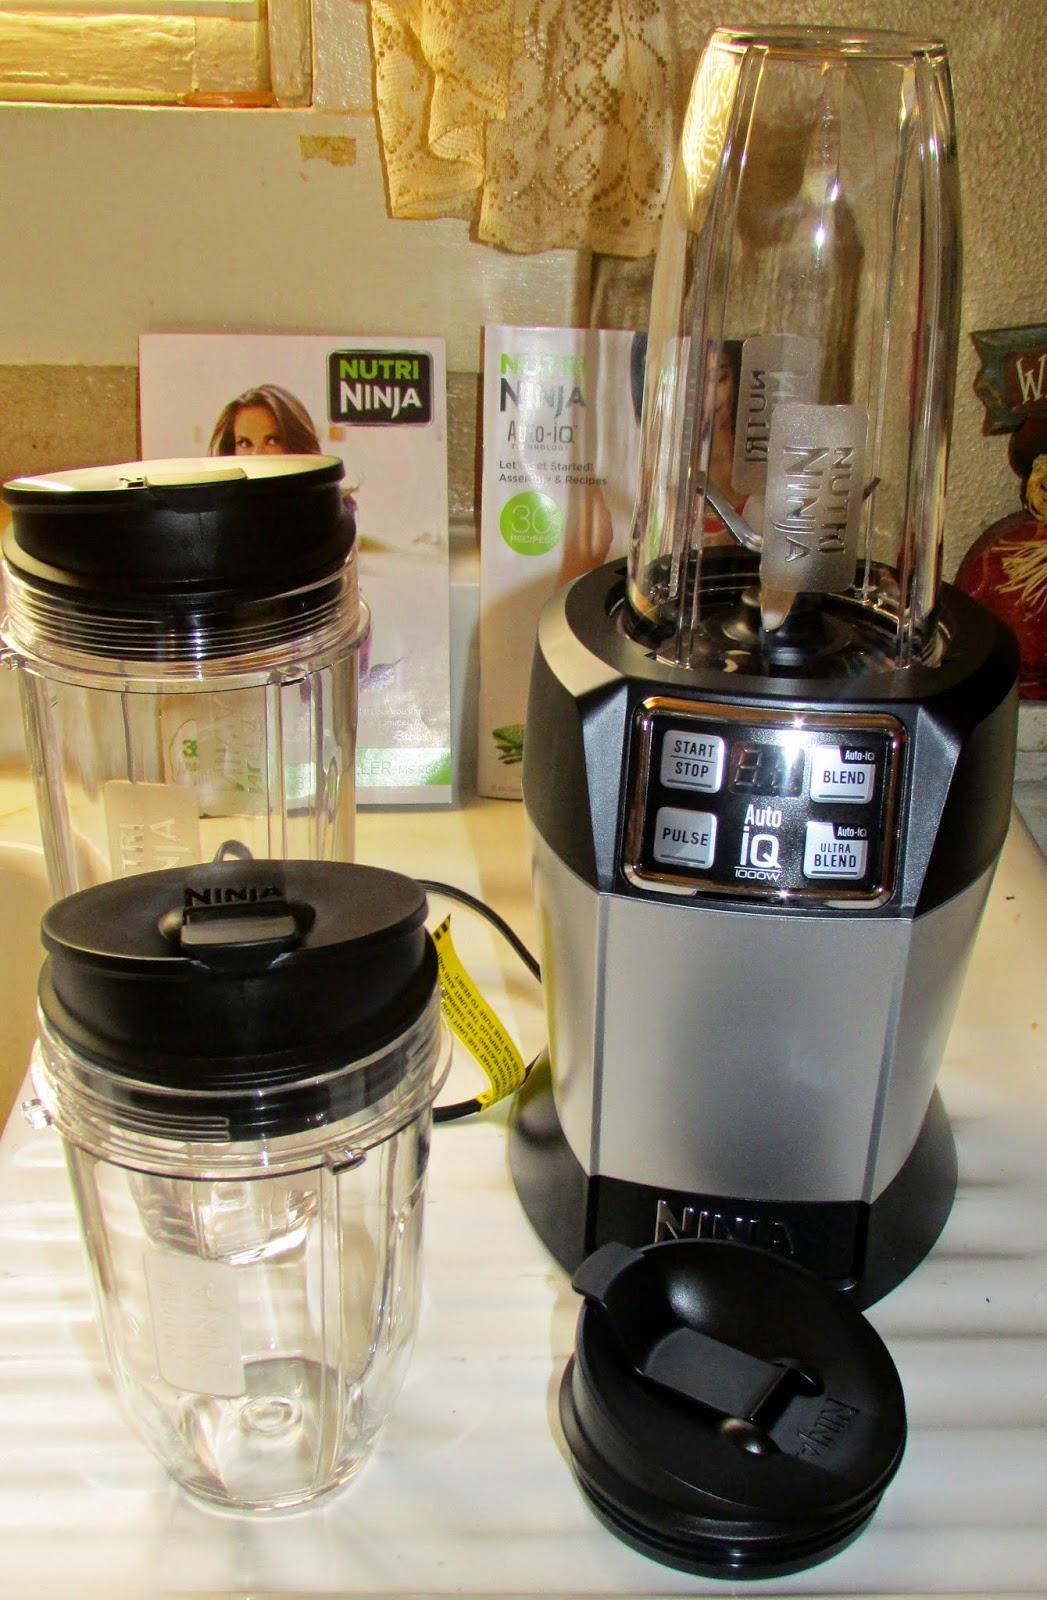 Ninja Nutri Ninja Bluk Complete Kitchen System Black Grey